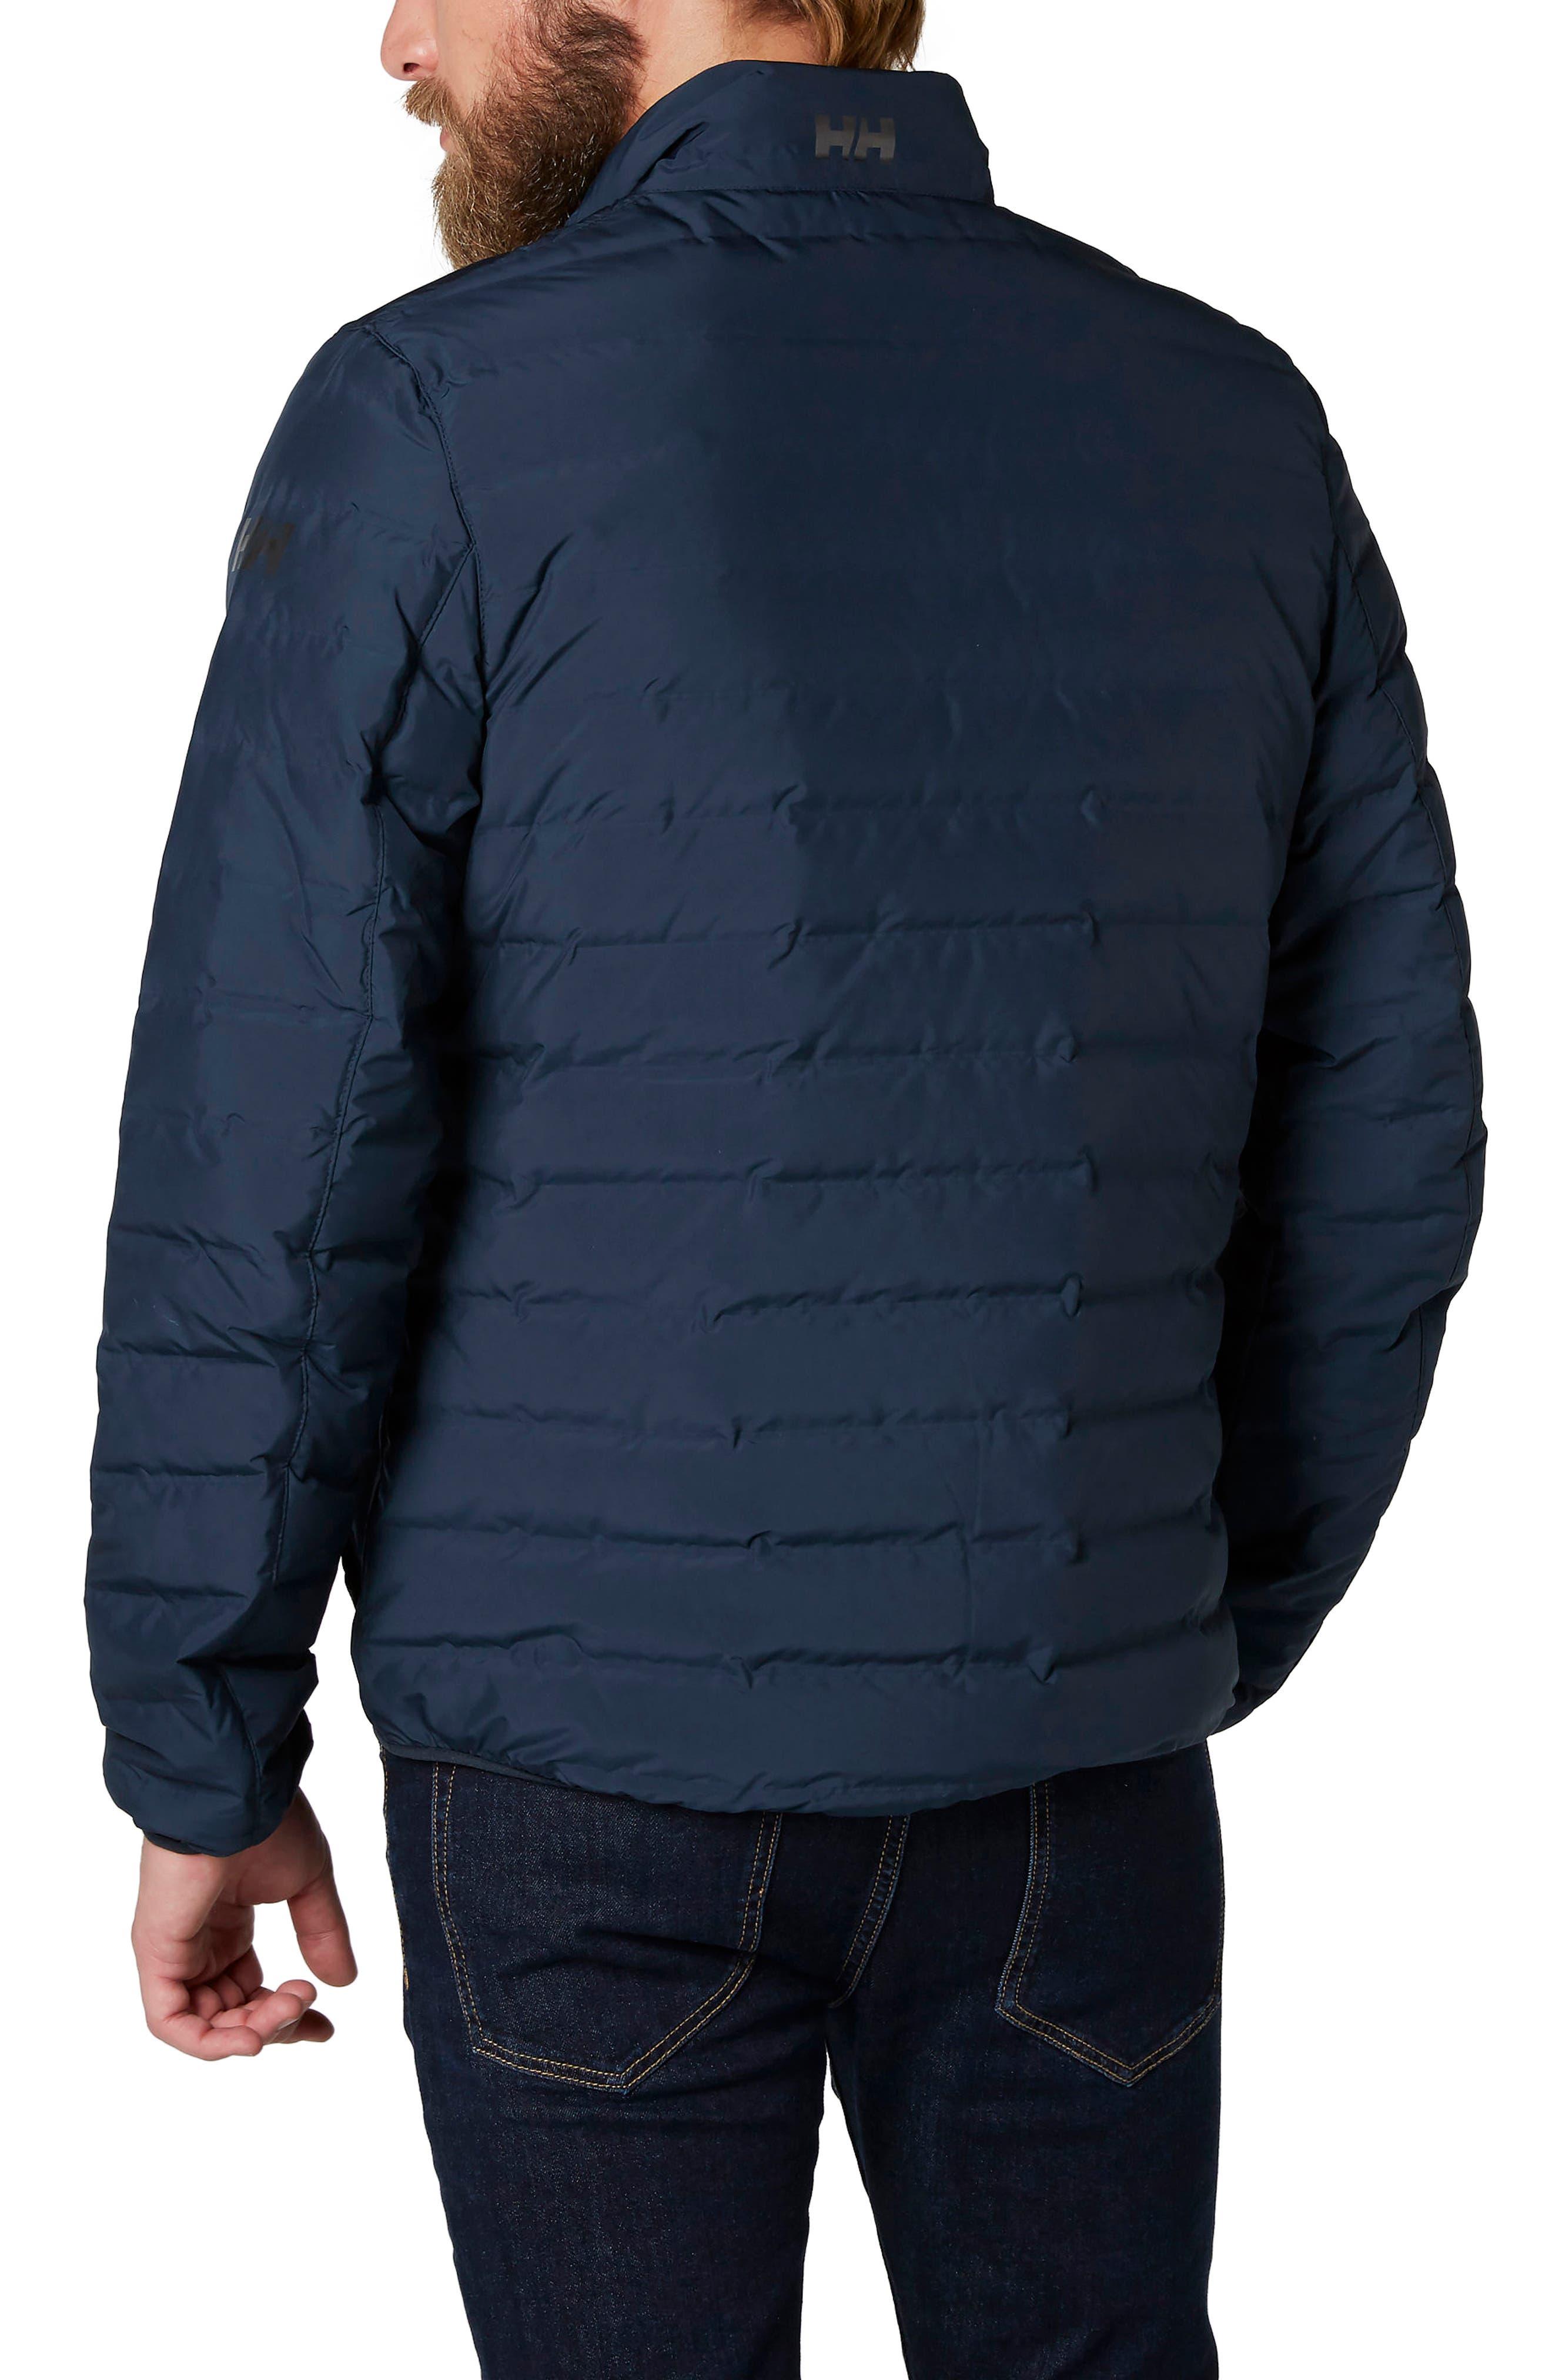 Urban Liner Jacket,                             Alternate thumbnail 2, color,                             NAVY